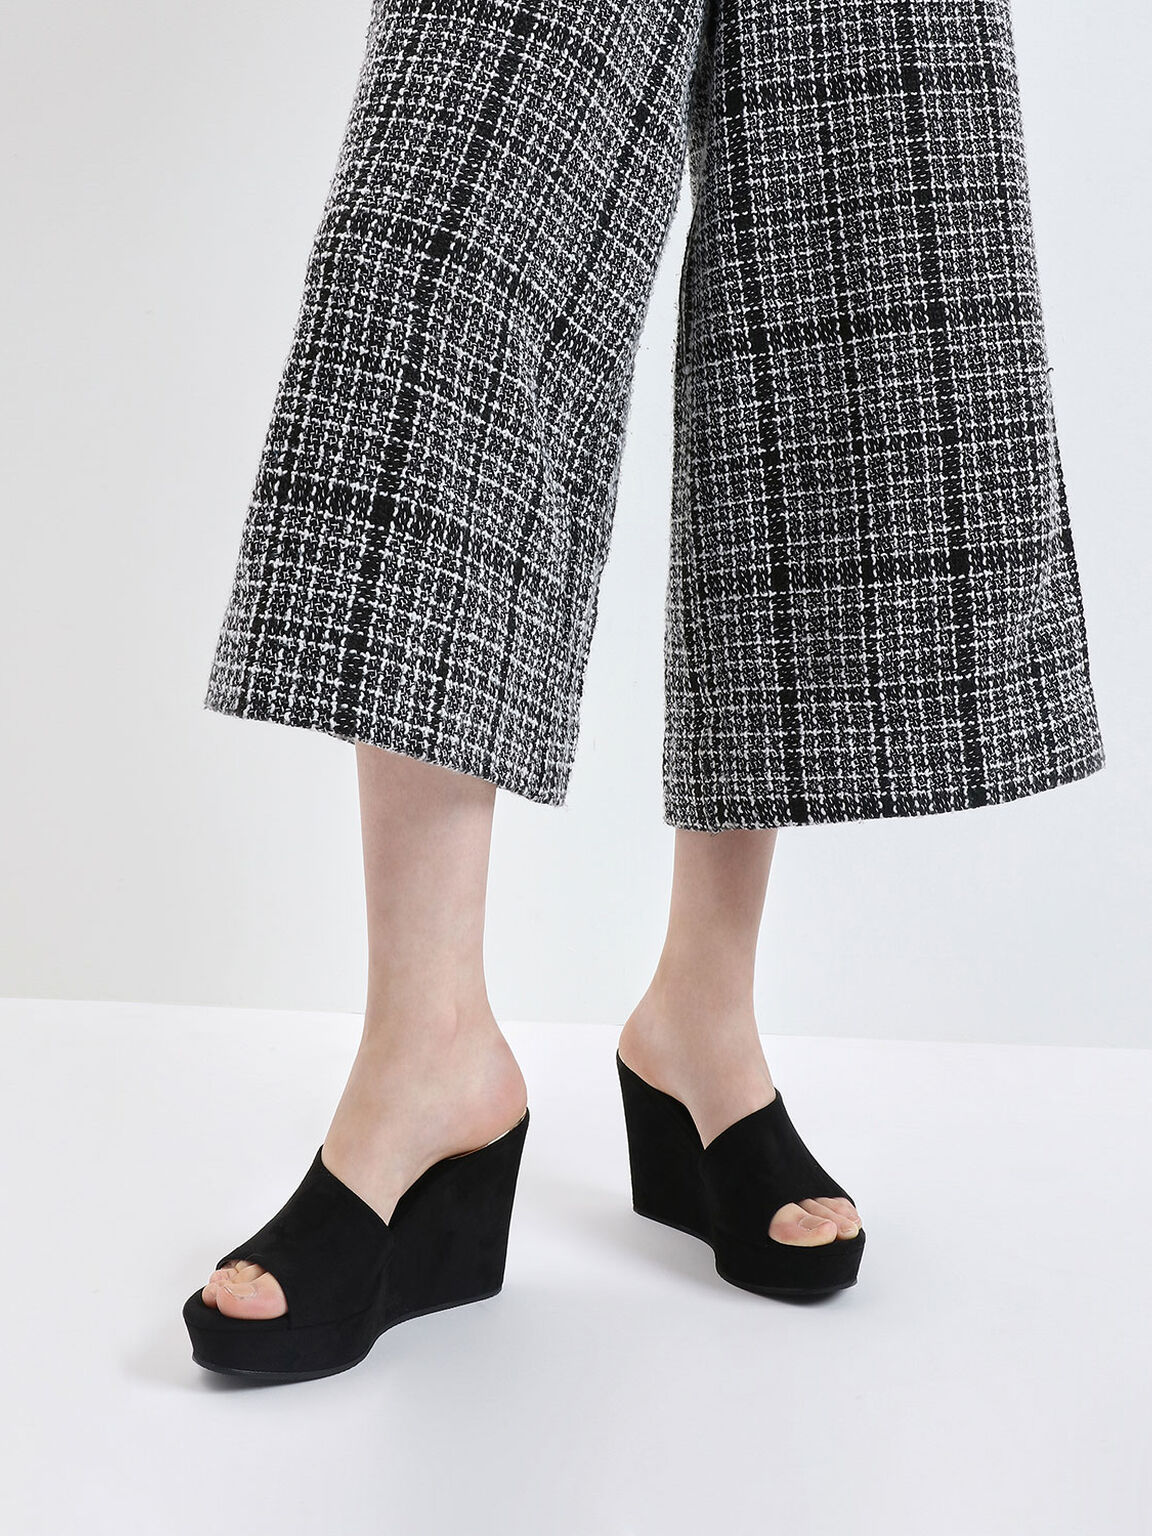 Asymmetric Textured Platform Wedges, Black, hi-res